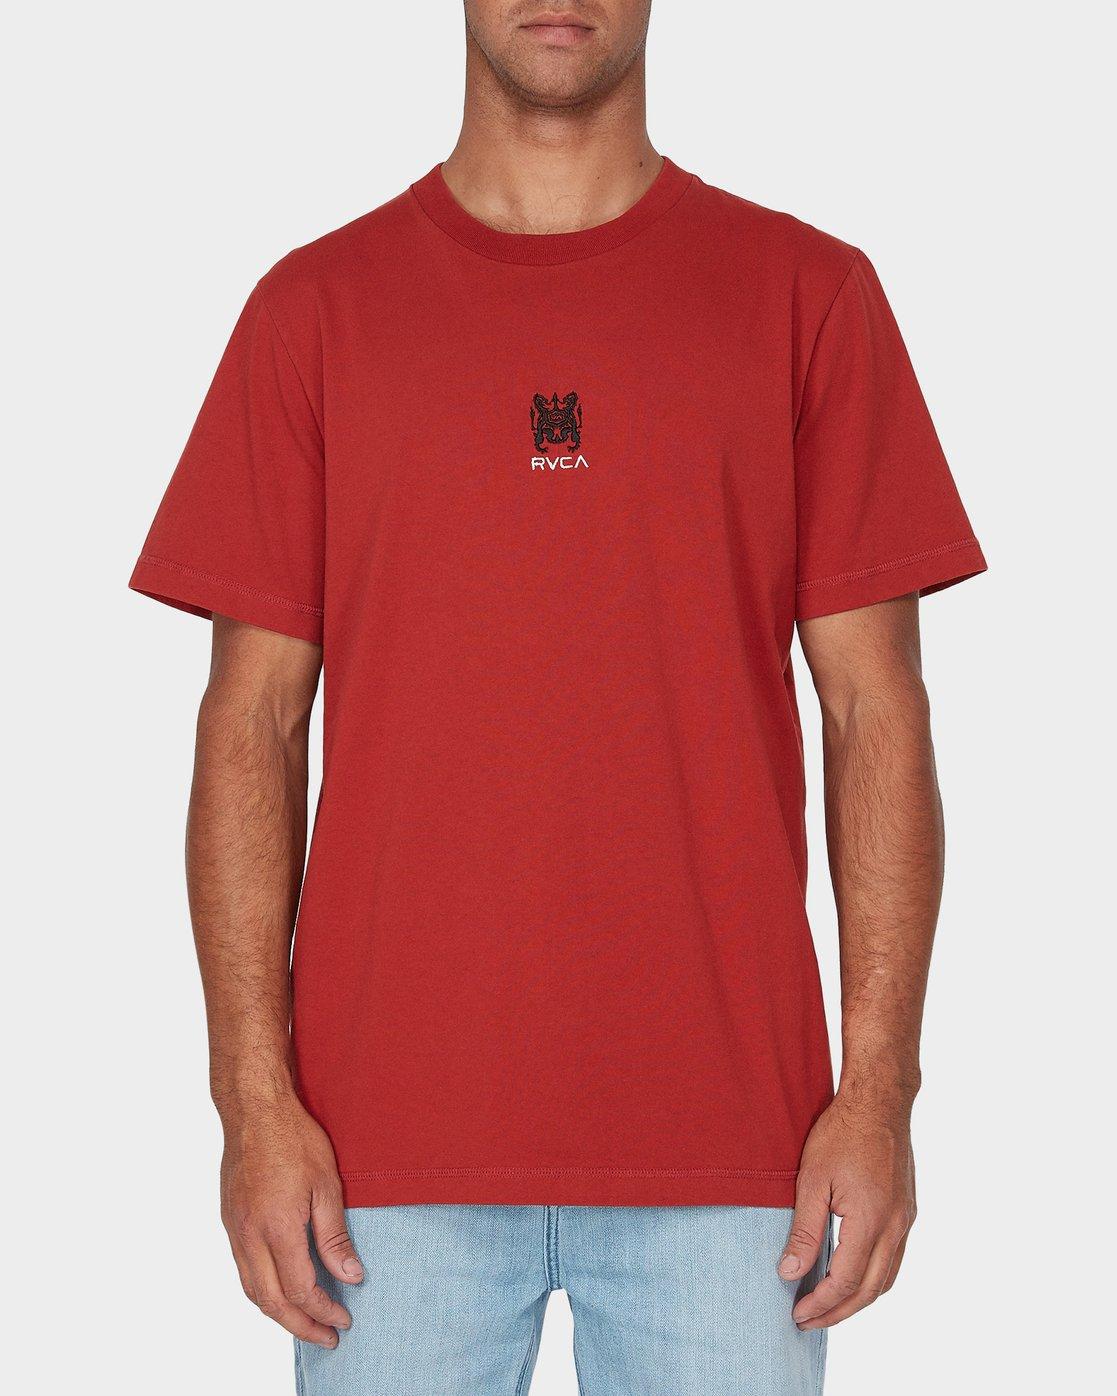 0 RVCA Crest Short Sleeve T-Shirt  R193055 RVCA